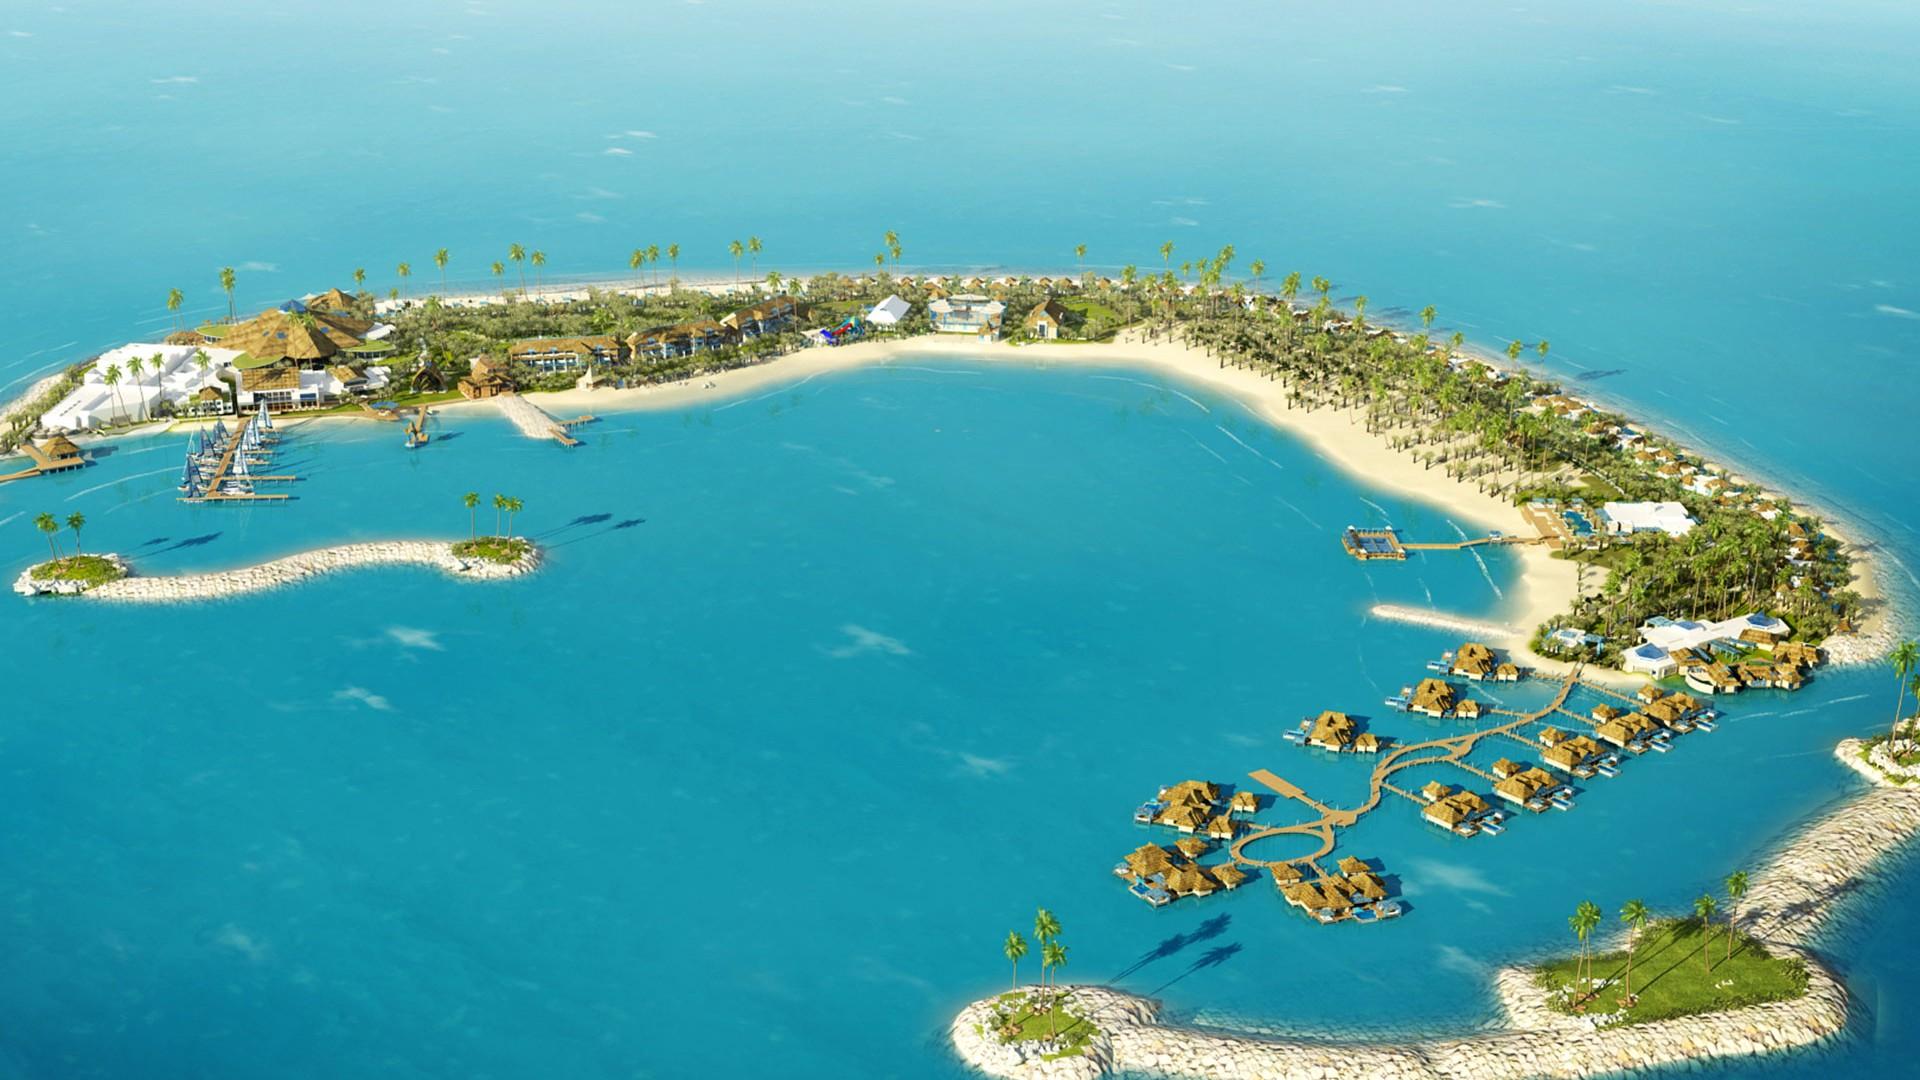 Banana Island Resort in Doha